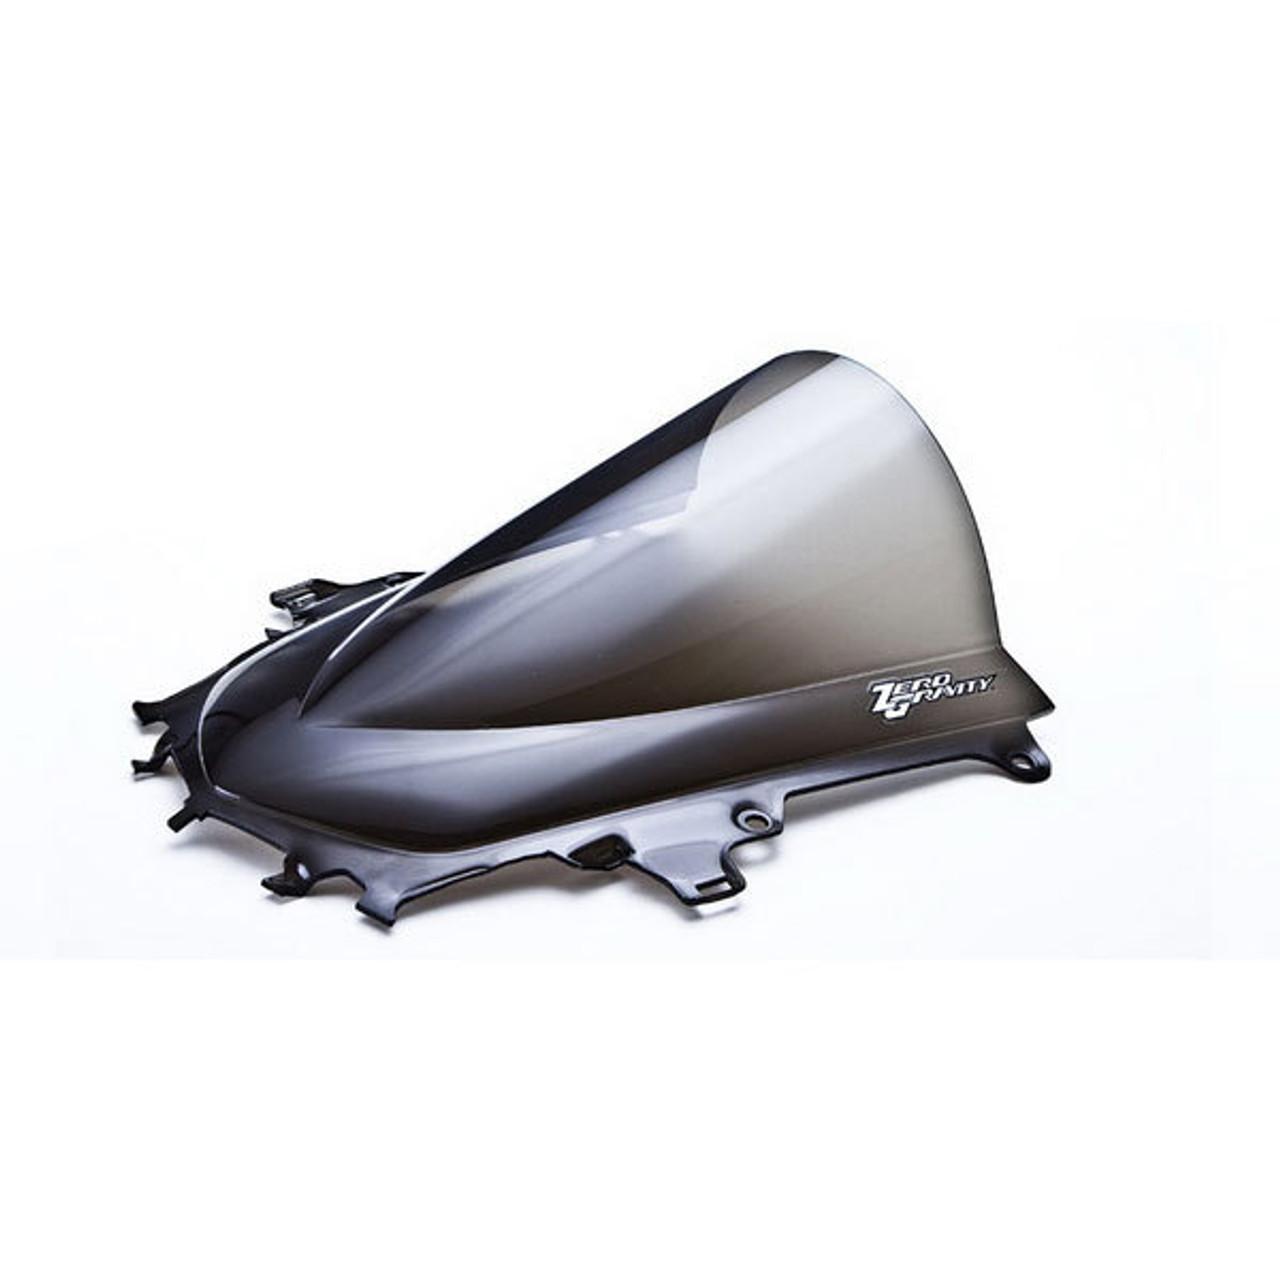 for 15-19 BMW S1000RR ZERO GRAVITY Double Bubble Windscreen Dark Smoke